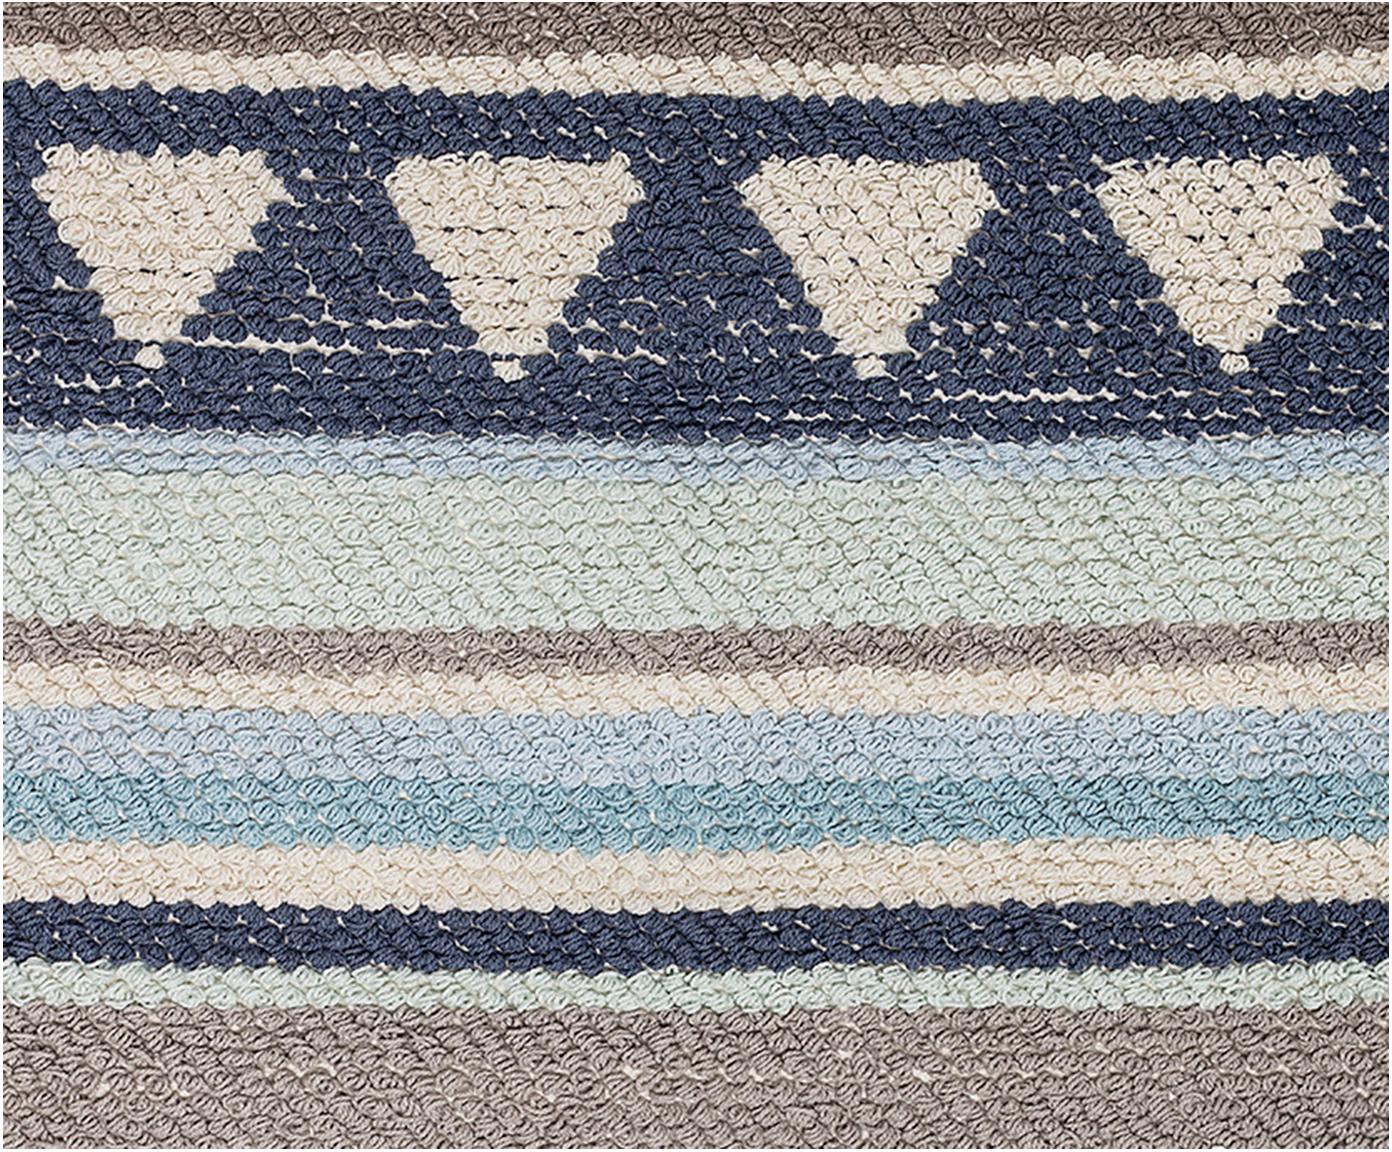 Teppich Nagou, Baumwolle, Blautöne, Grau, Beige, 60 x 90 cm